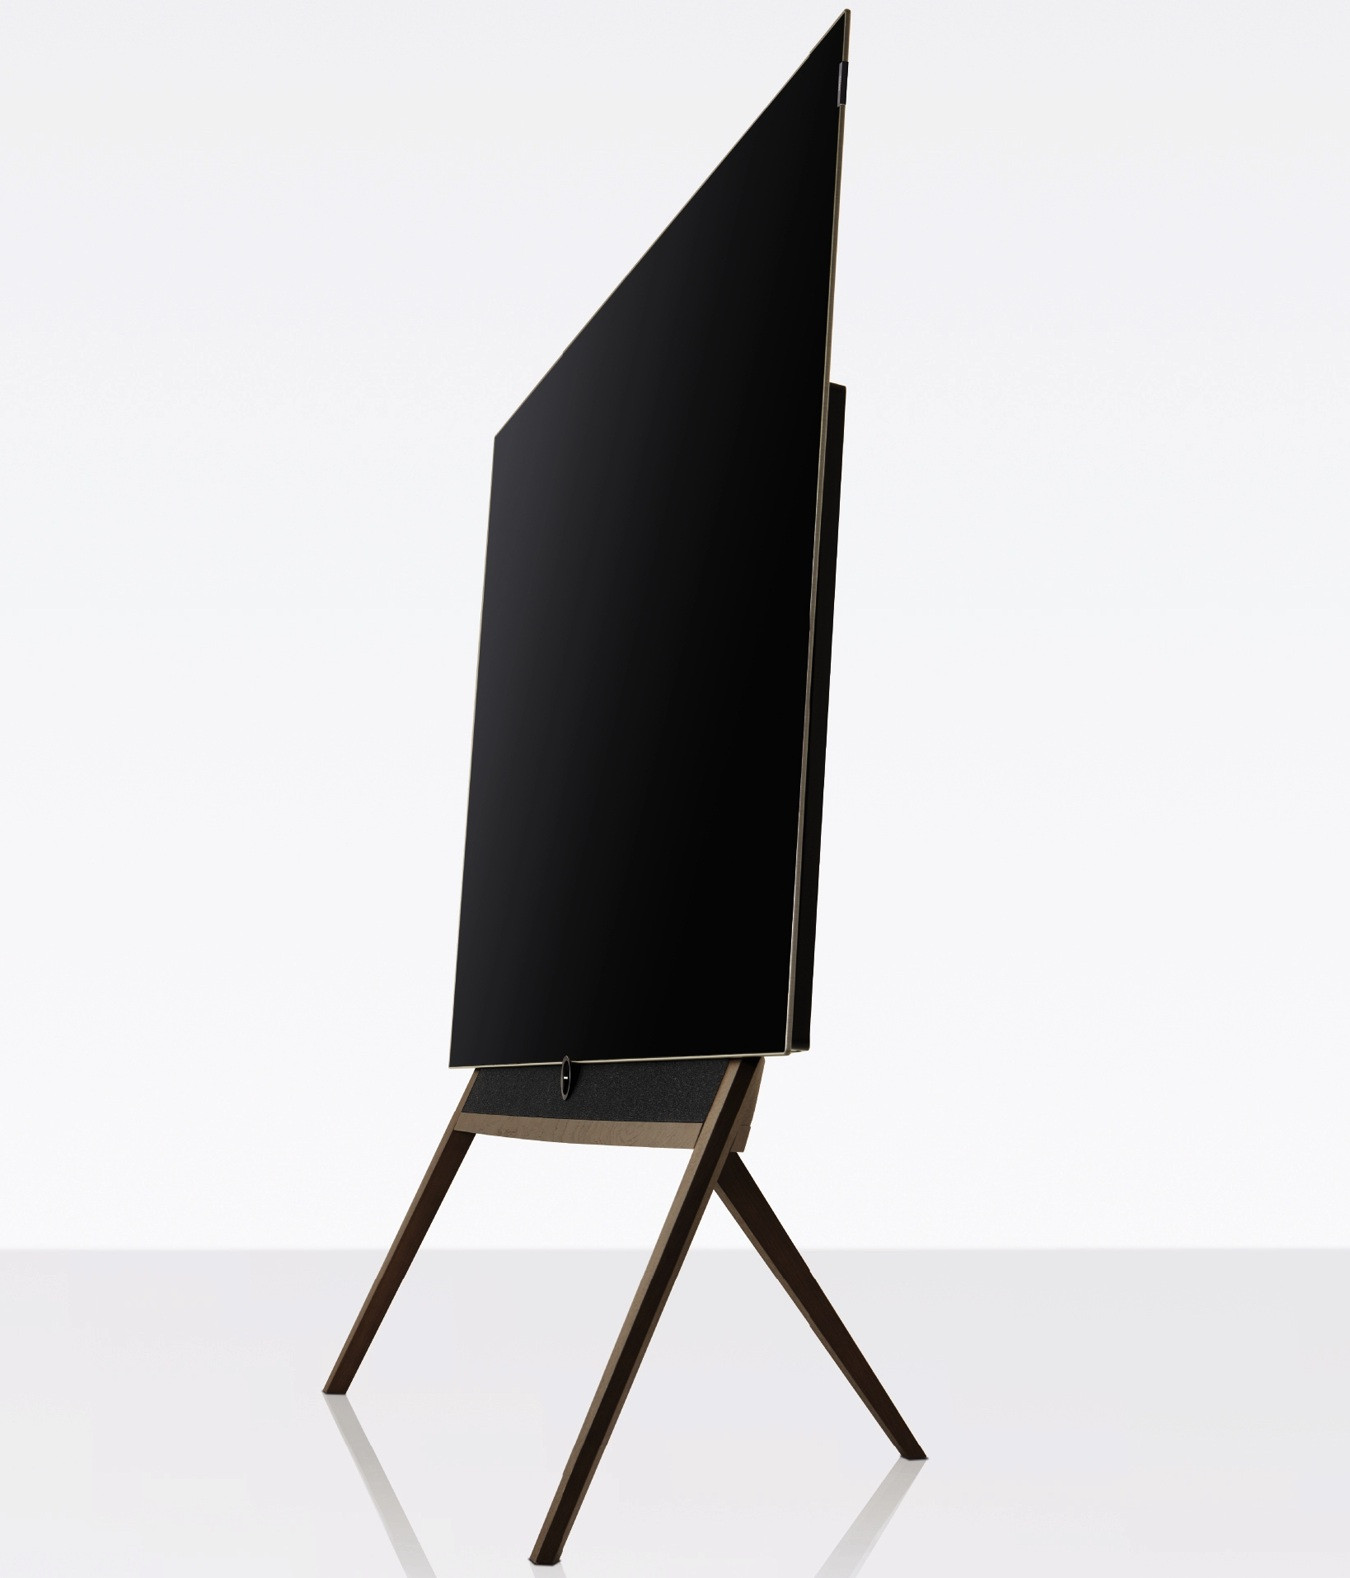 loewe bild oled mit lautsprecher floorstand silver oak. Black Bedroom Furniture Sets. Home Design Ideas